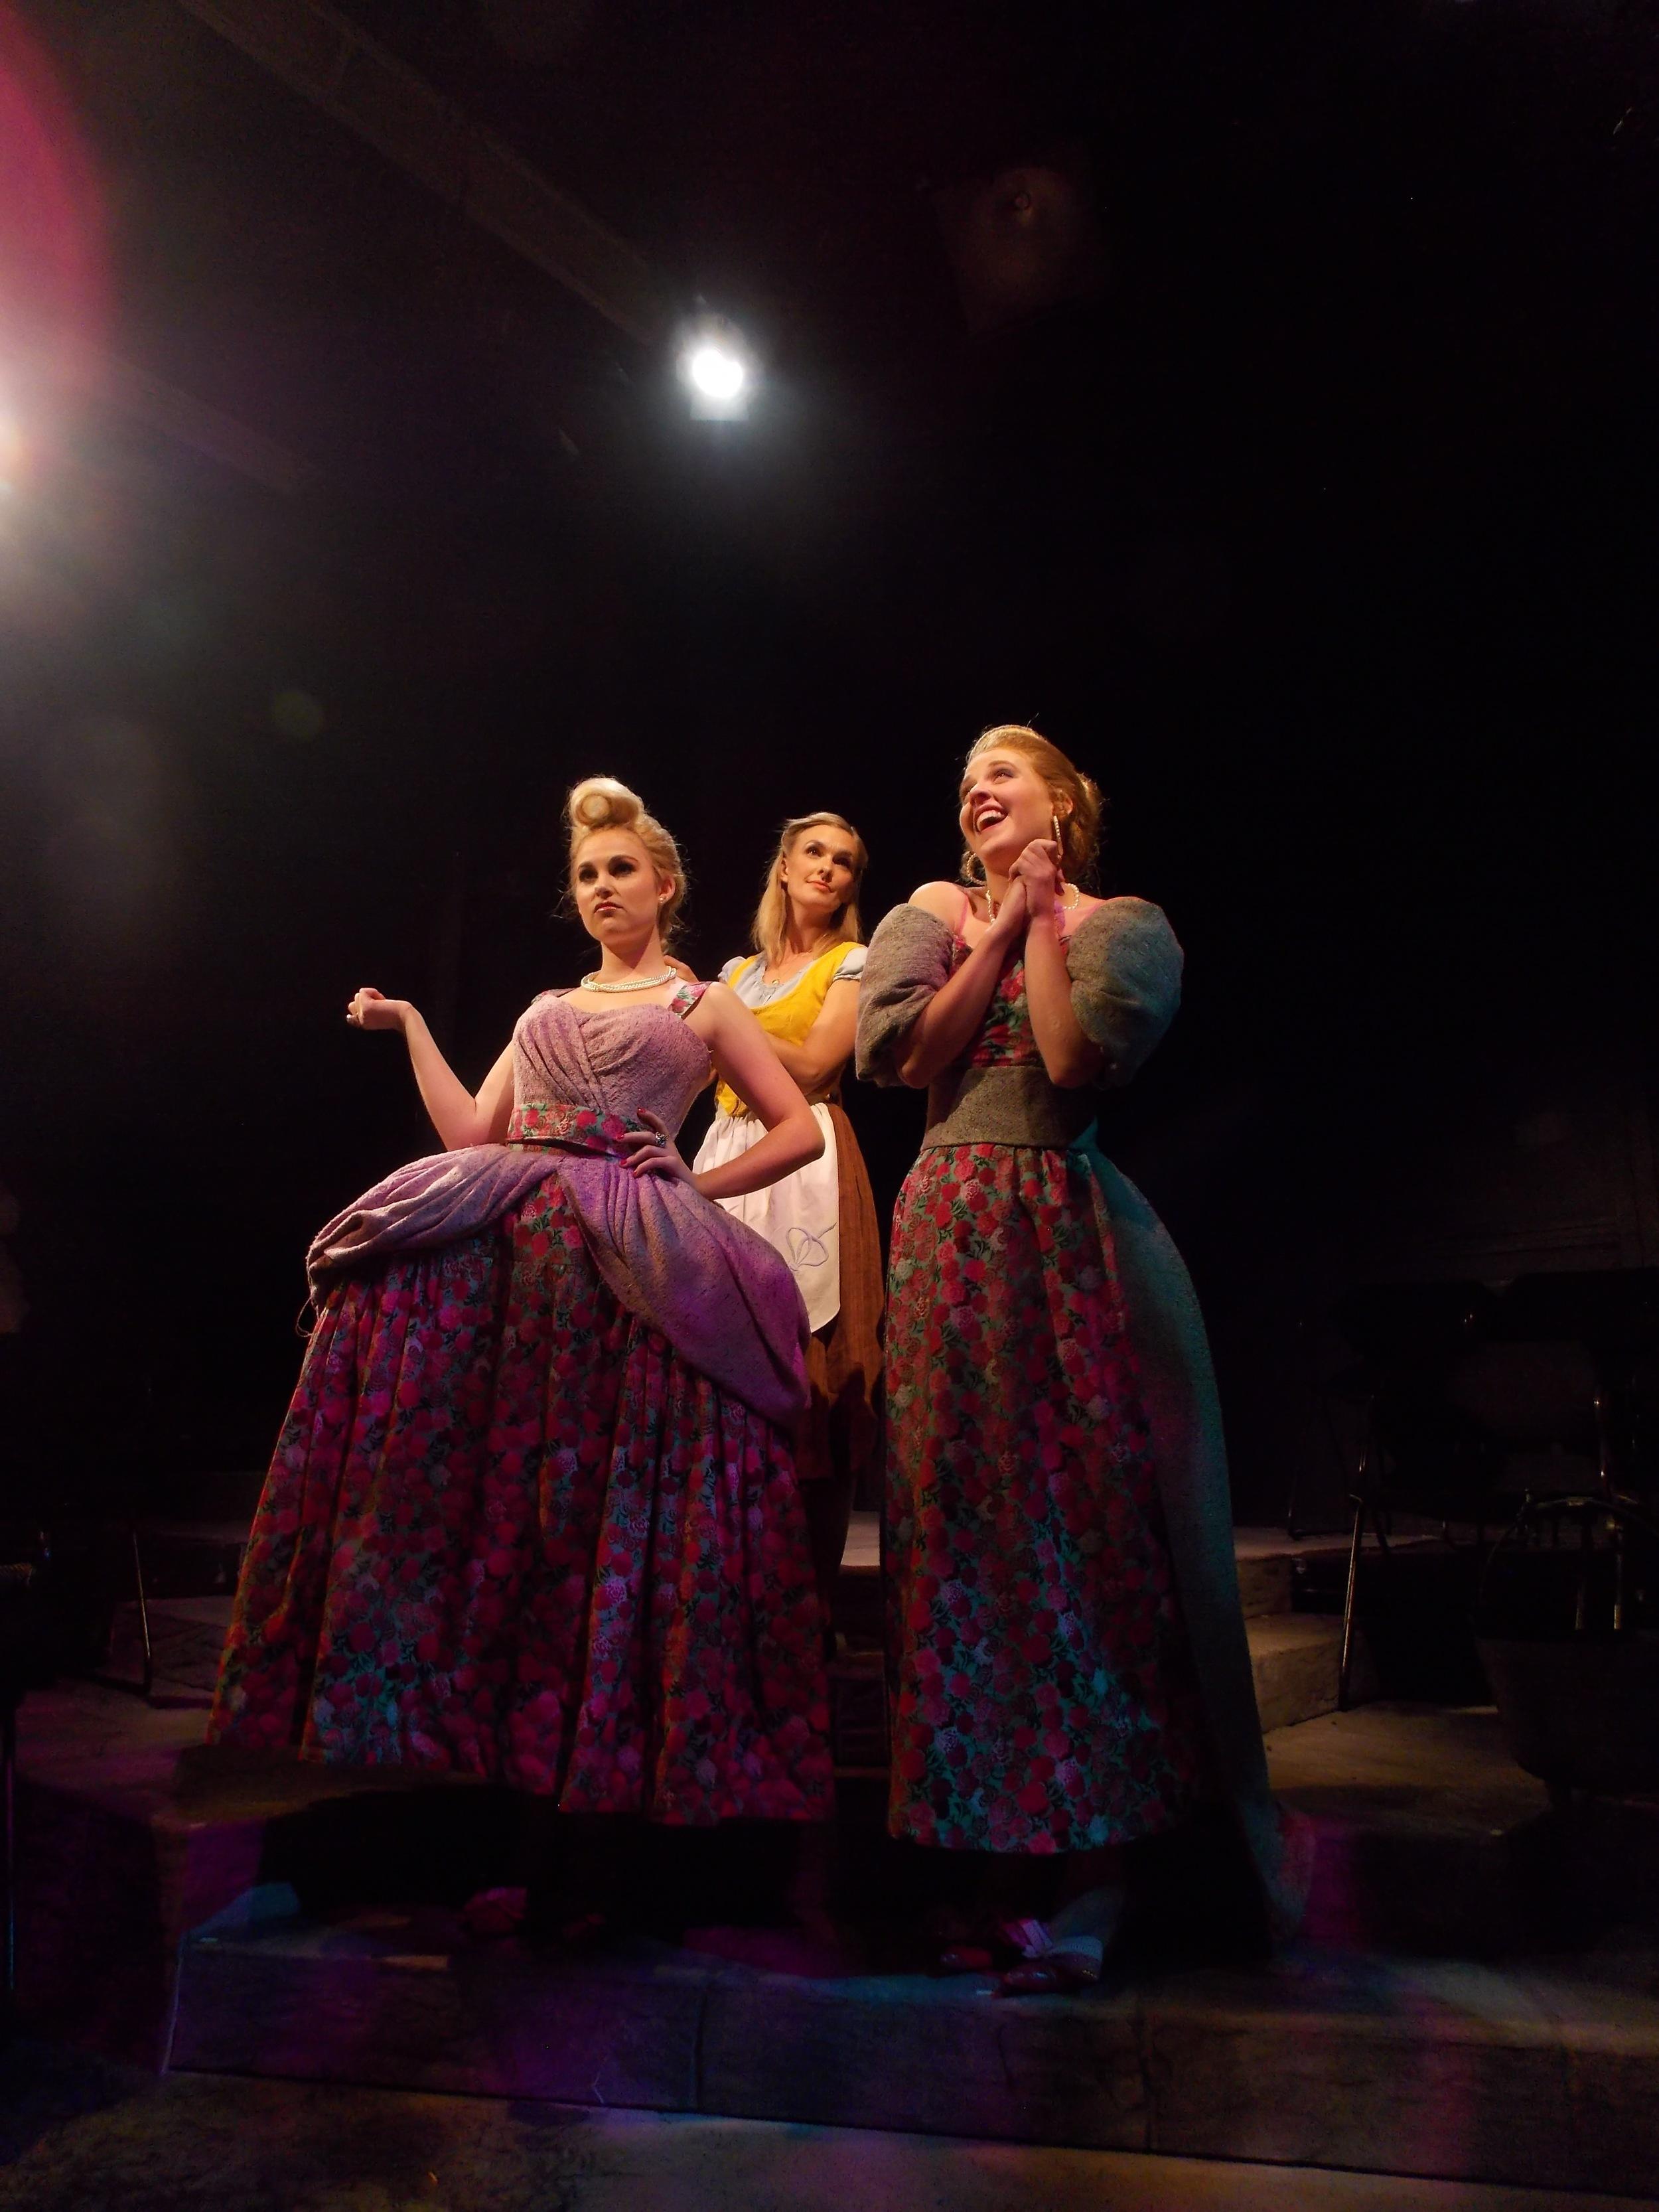 Cinderella (Liv Stevns) and the Stepsisters (Kelli Plaisted & Belle Adams)  Photo courtesy of AJ Paulin.